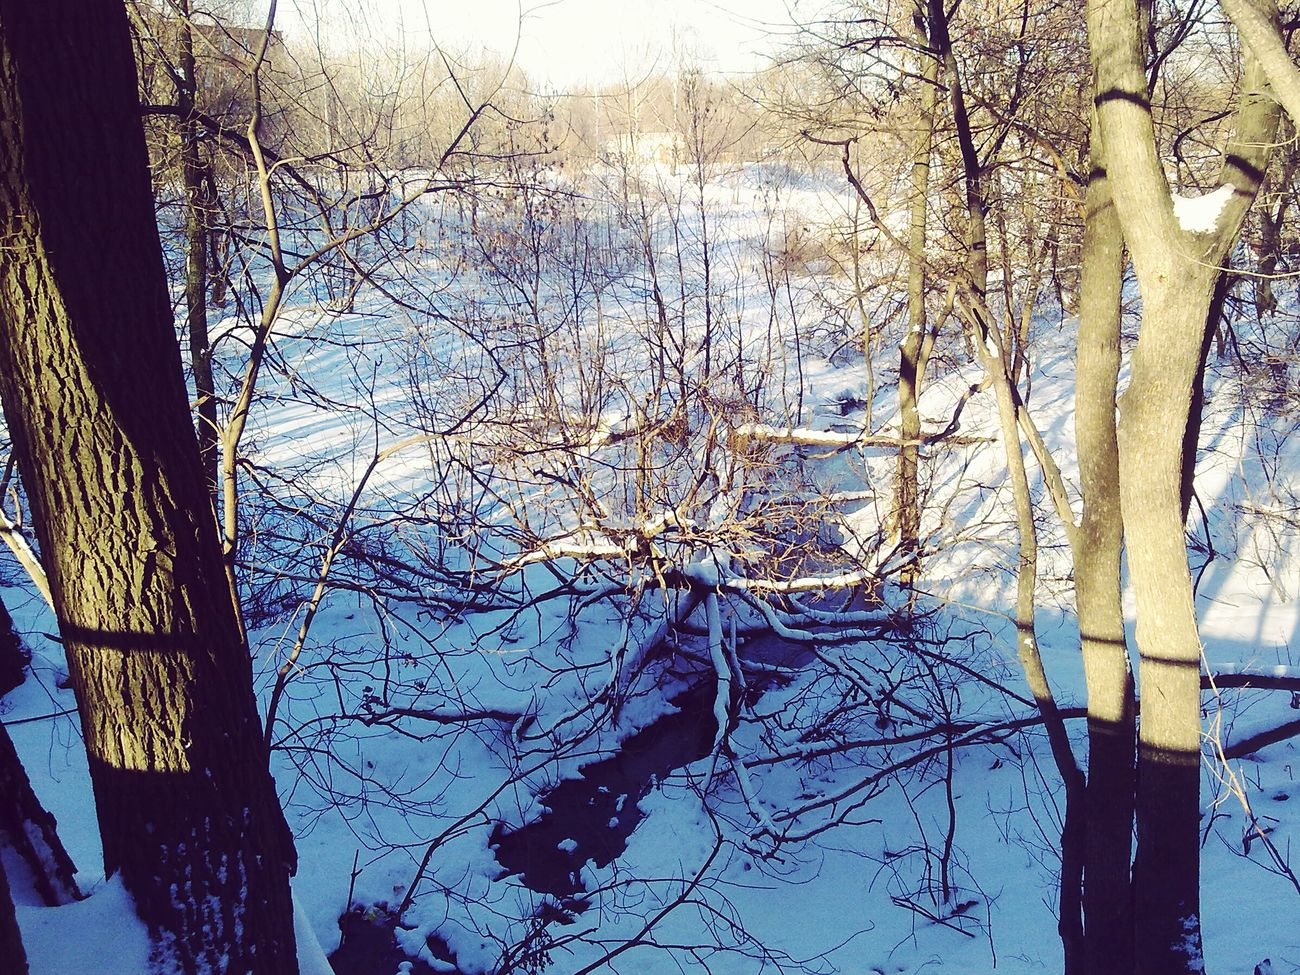 Walking Around Winter Winter Wonderland Sunlight Nature Snow